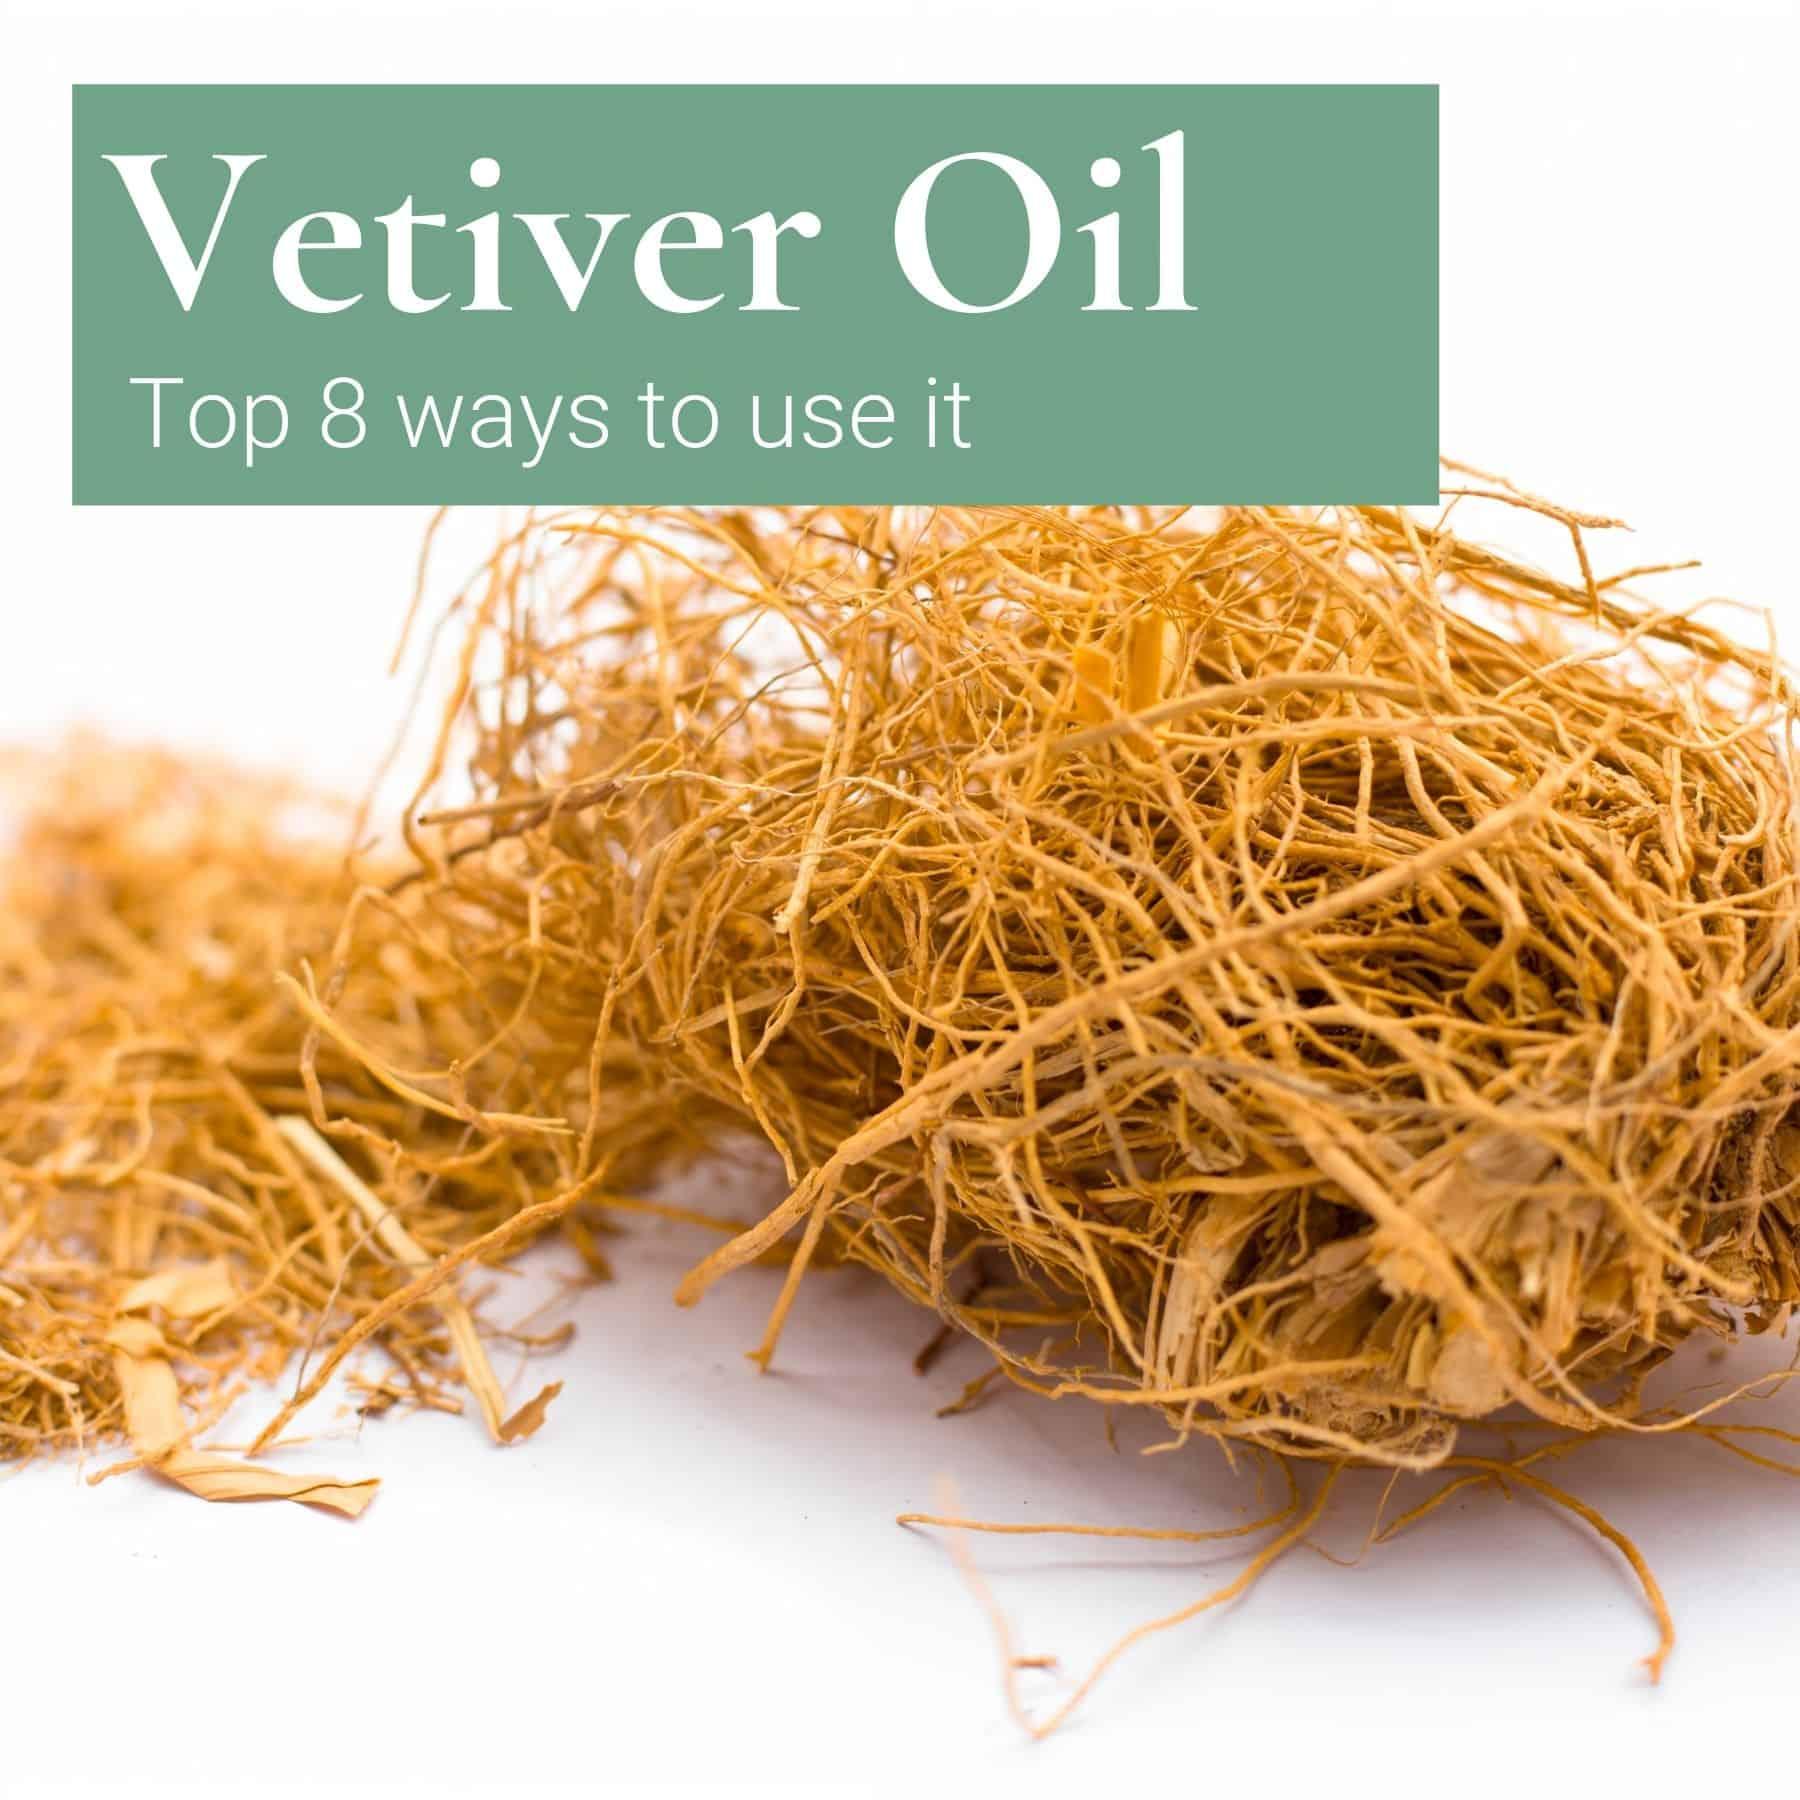 vetiver oil uses